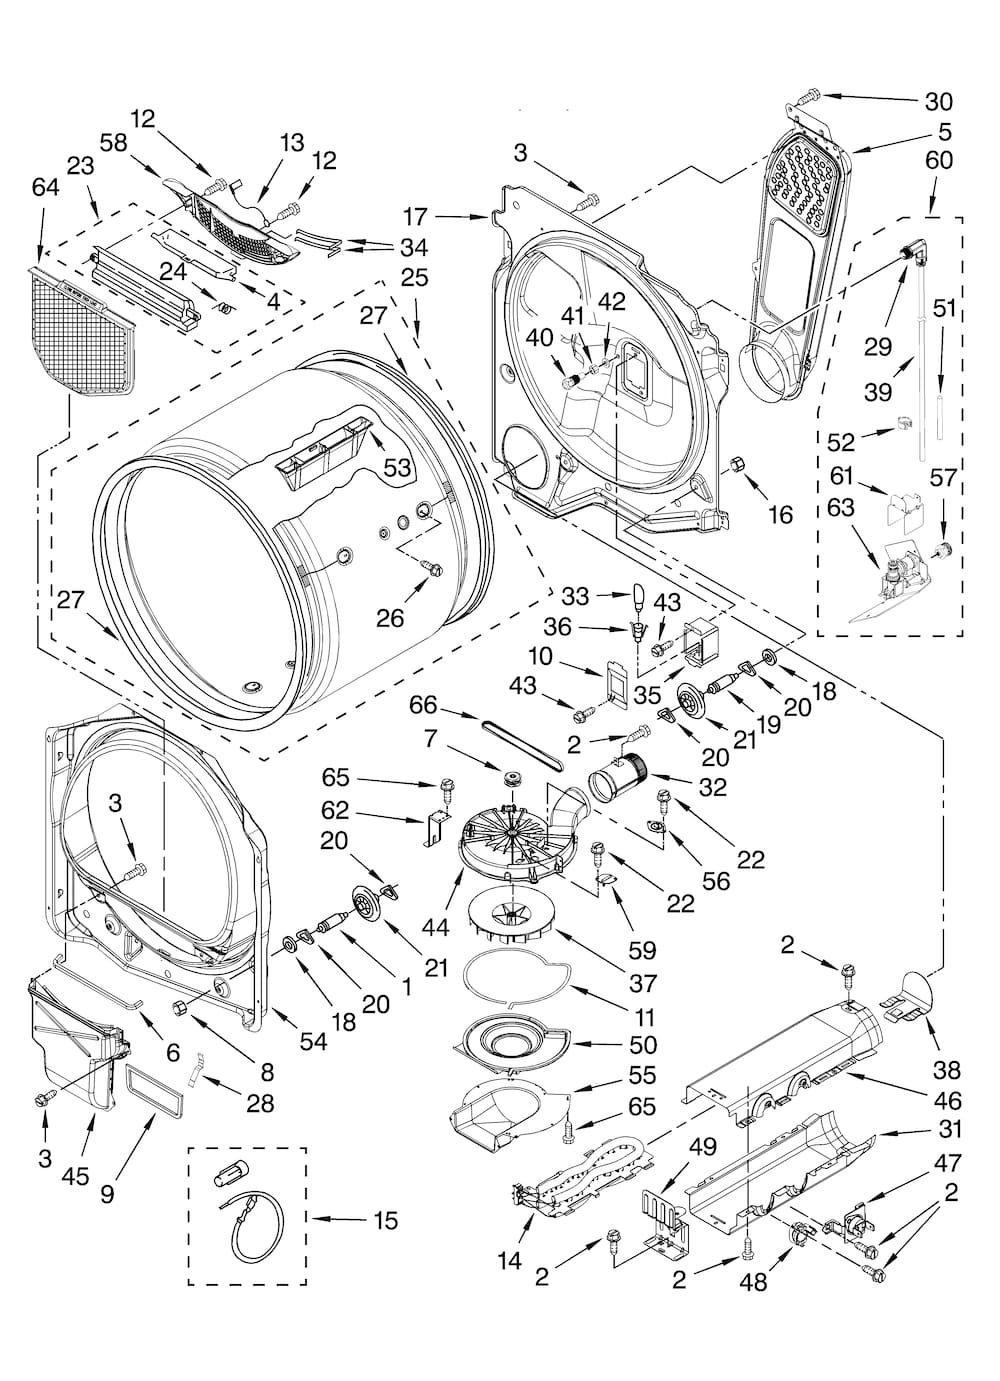 Kenmore Elite Dryer Parts Diagram : kenmore, elite, dryer, parts, diagram, KENMORE, ELITE, RESIDENTIAL, DRYER, Parts, Model, 11068062801, Sears, PartsDirect, Kenmore,, Screen, Door,, Kenmore, Elite